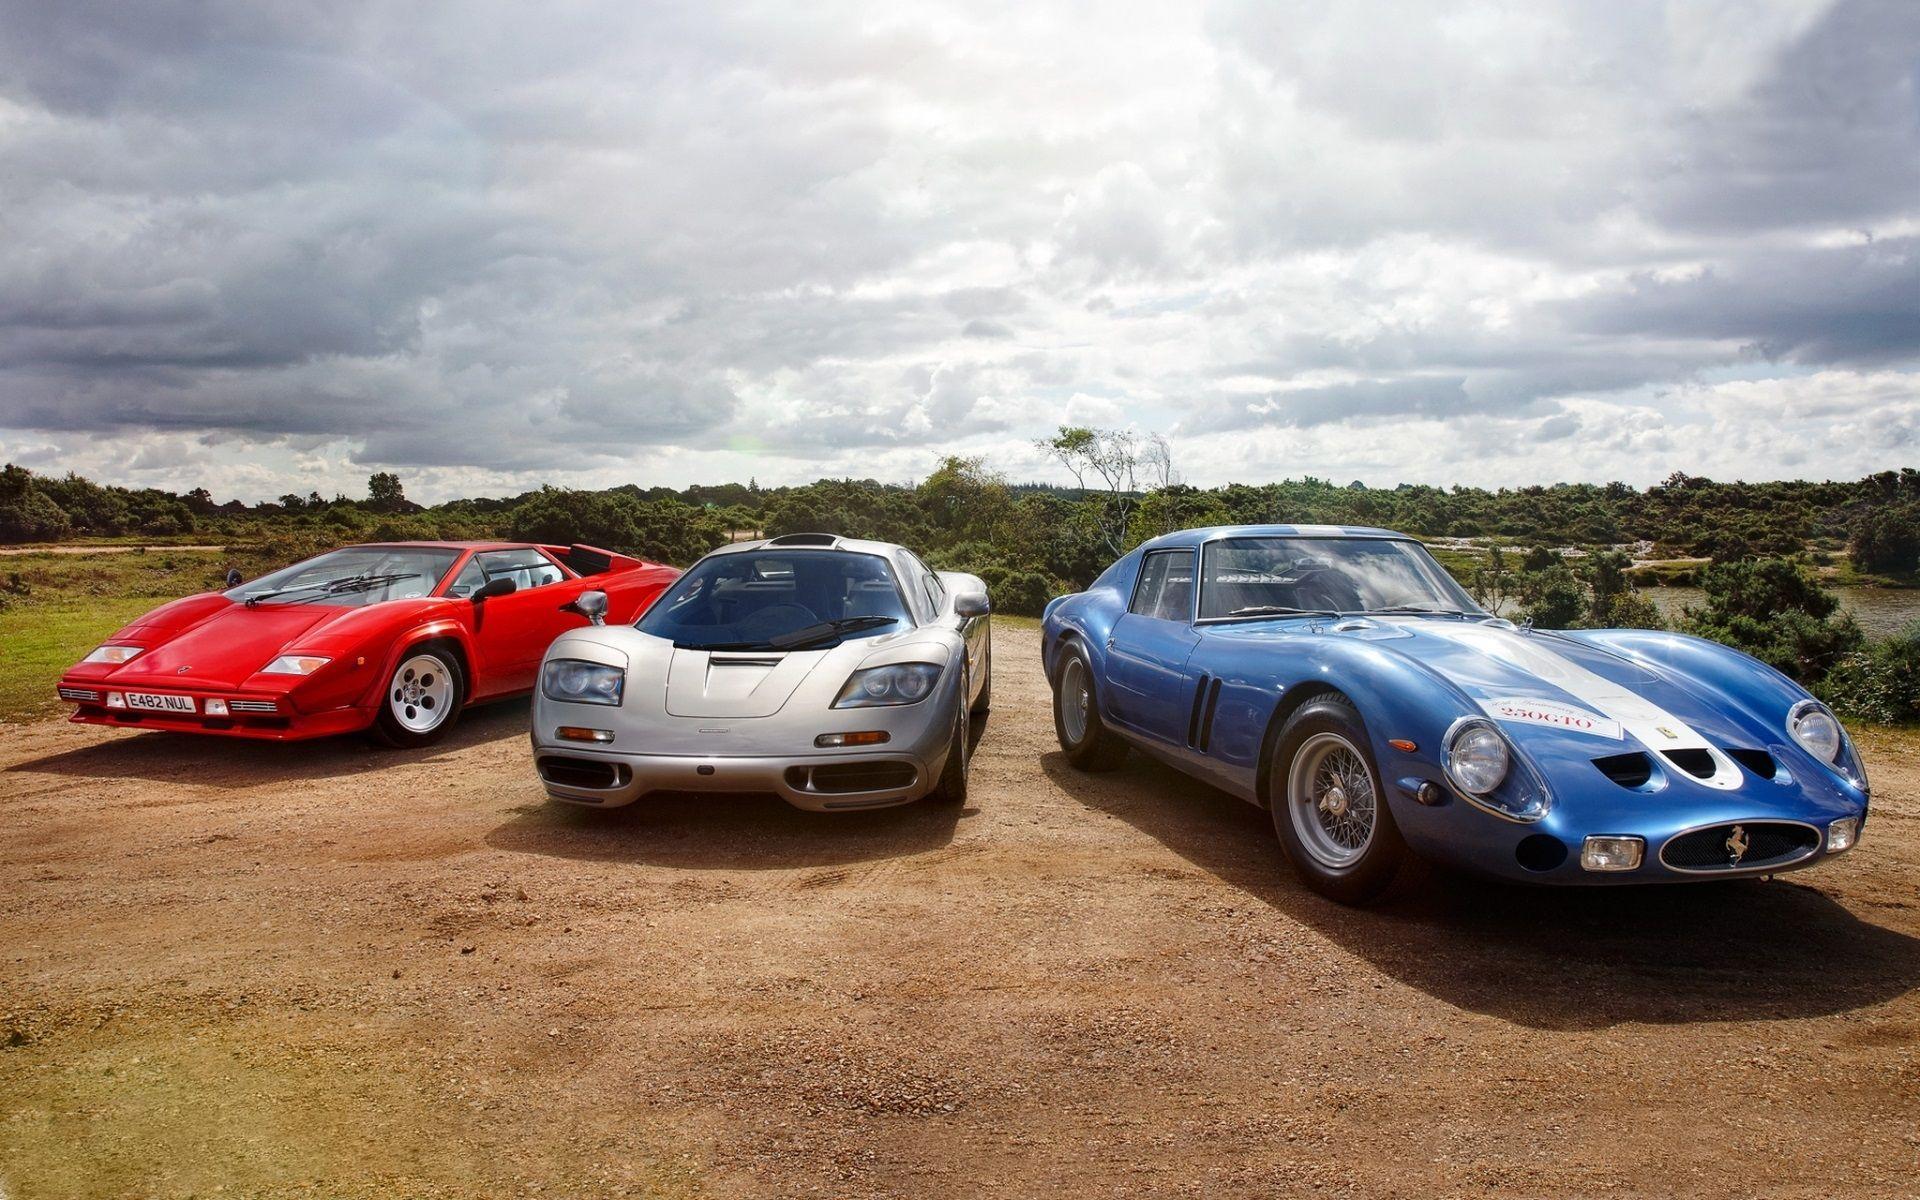 Classic Ferrari Wallpapers Top Free Classic Ferrari Backgrounds